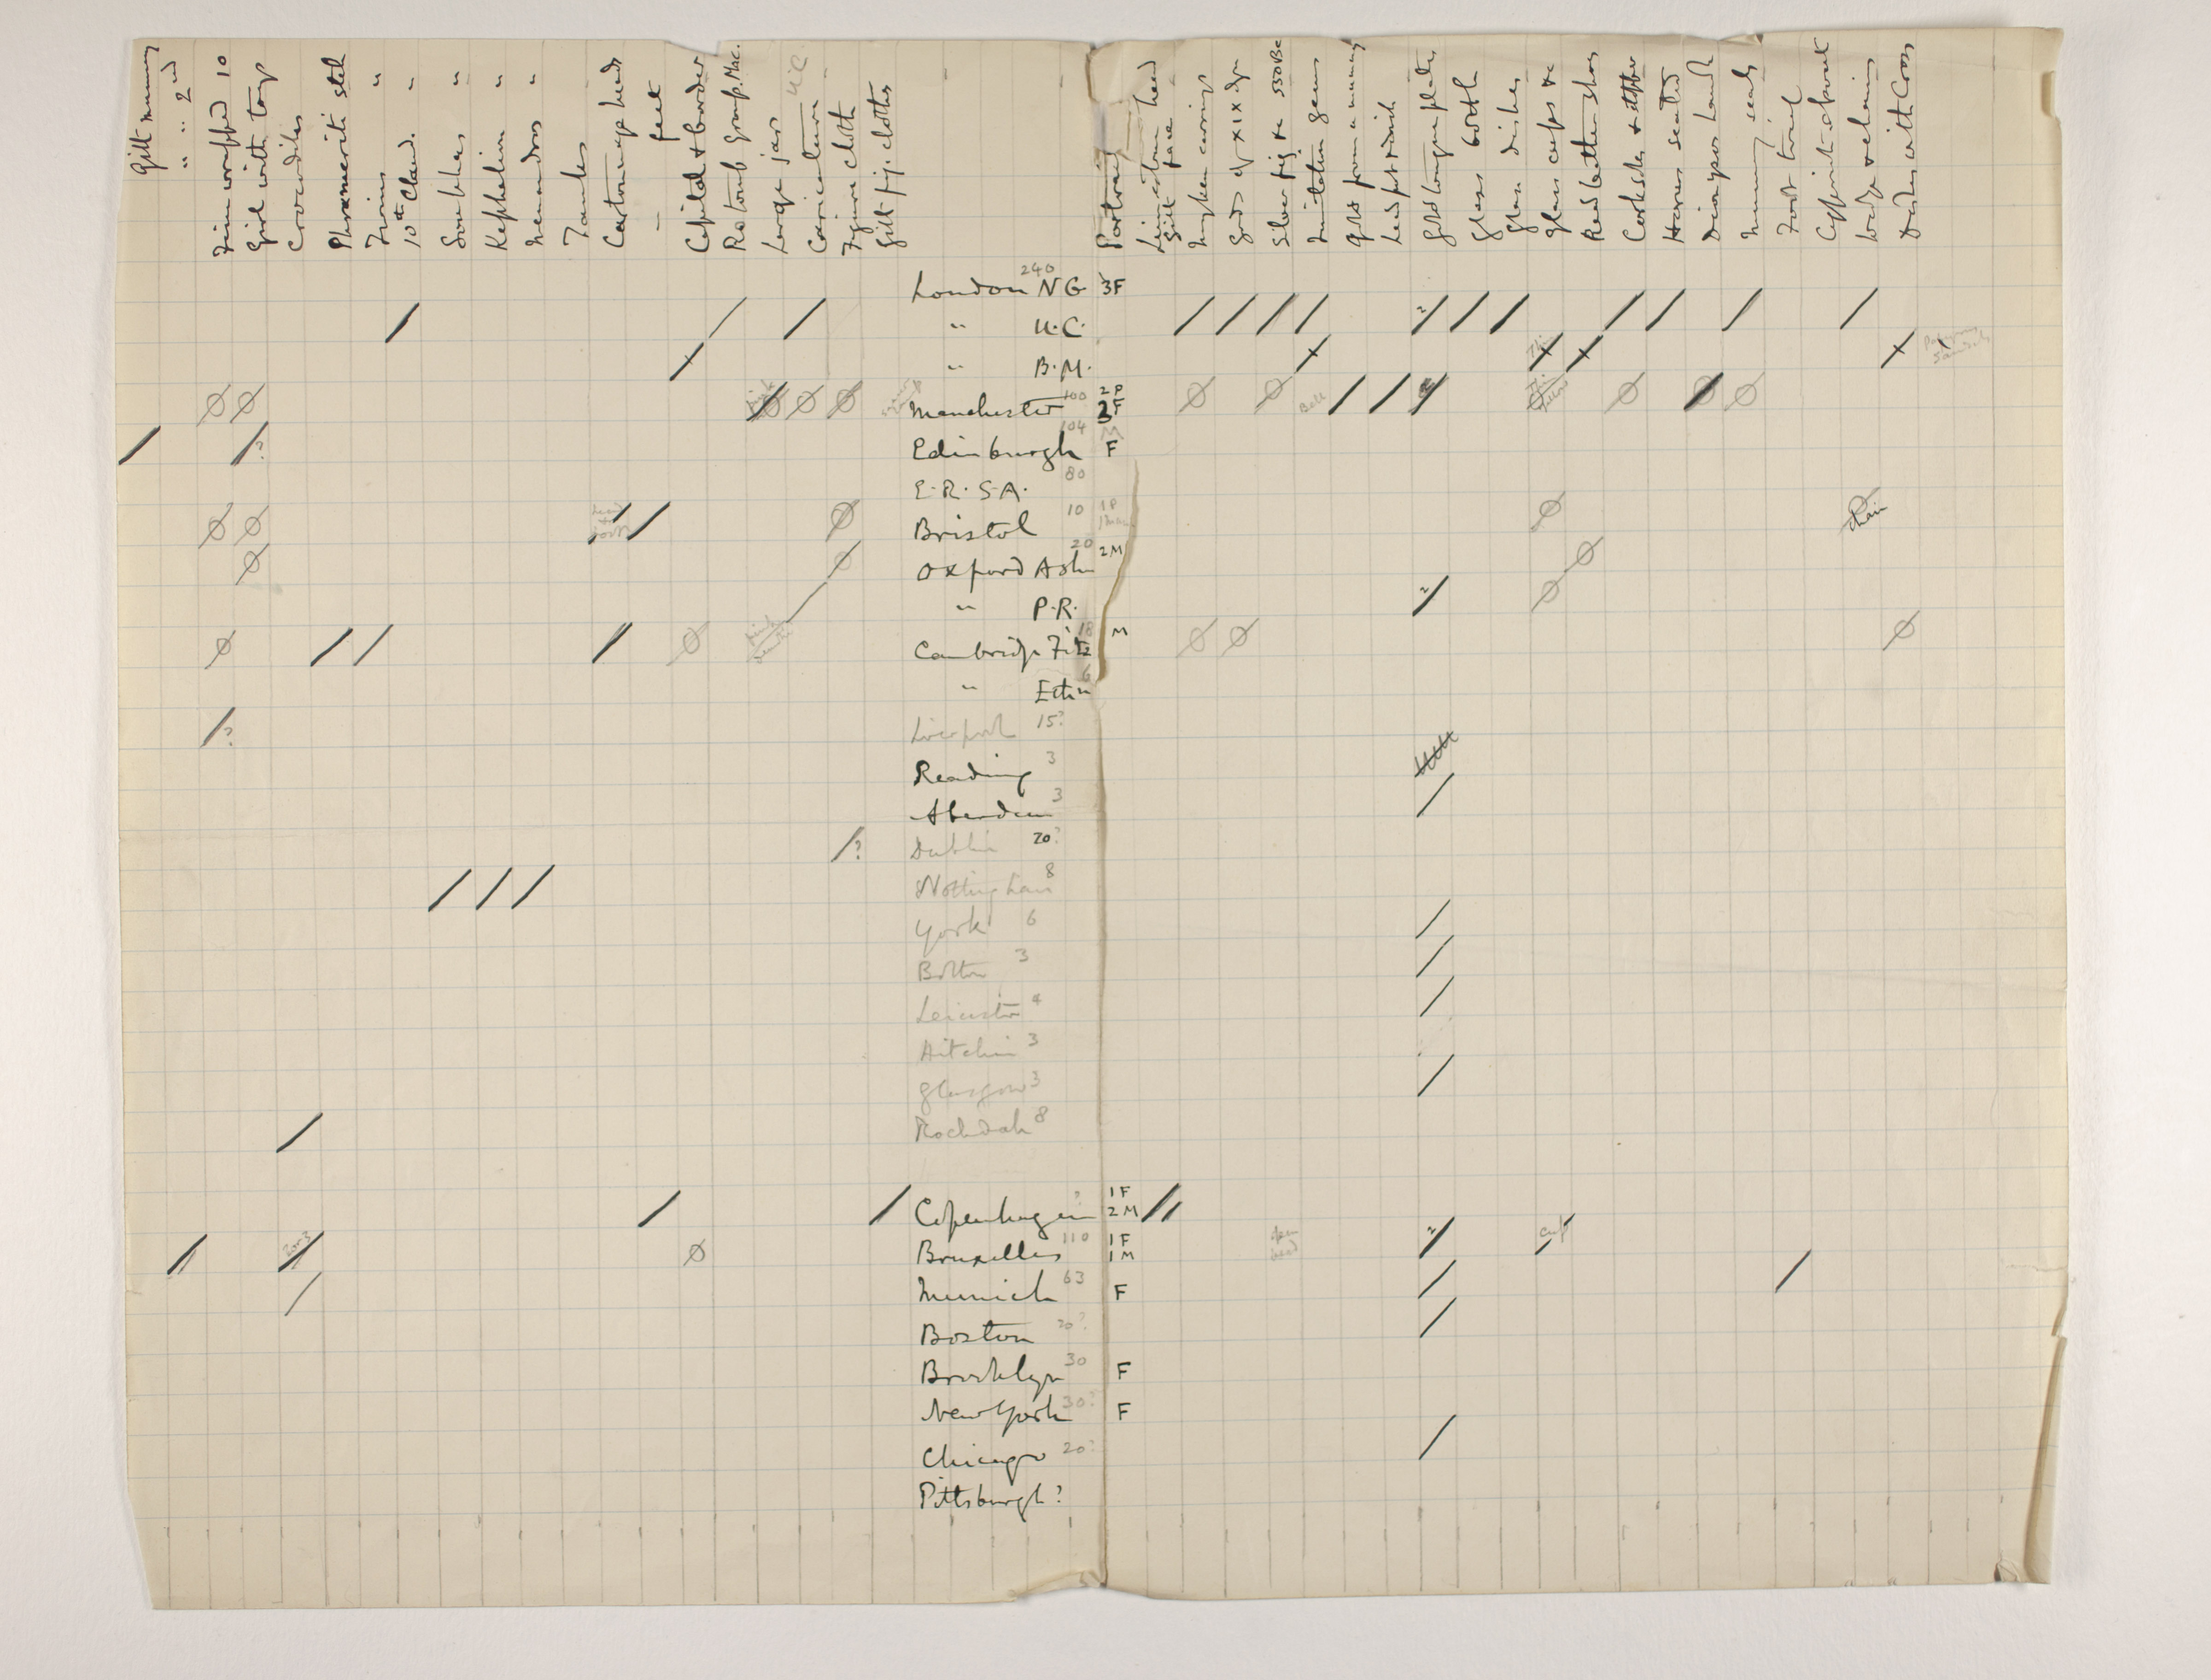 1910-11 Hawara, Gerzeh, Memphis, Mazghuneh Distribution grid PMA/WFP1/D/19/3